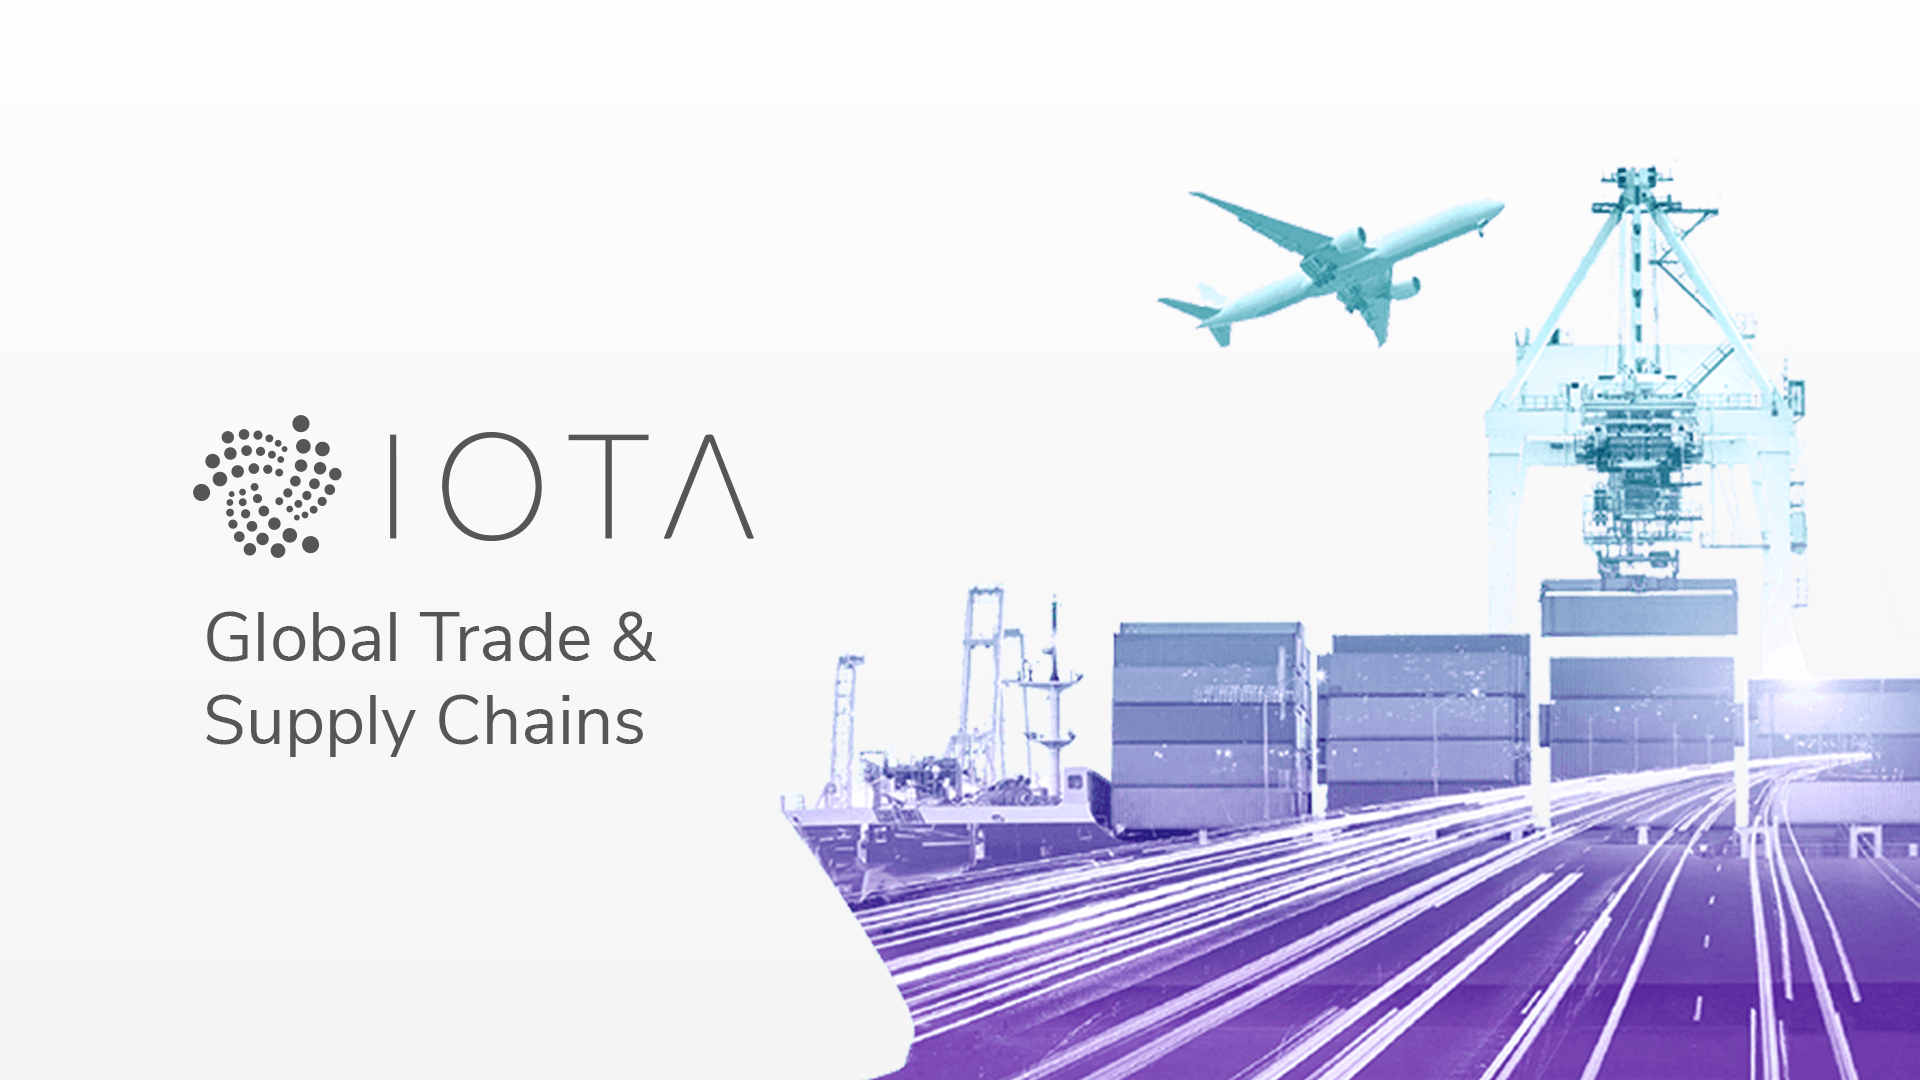 Global Trade & Supply Chains | IOTA